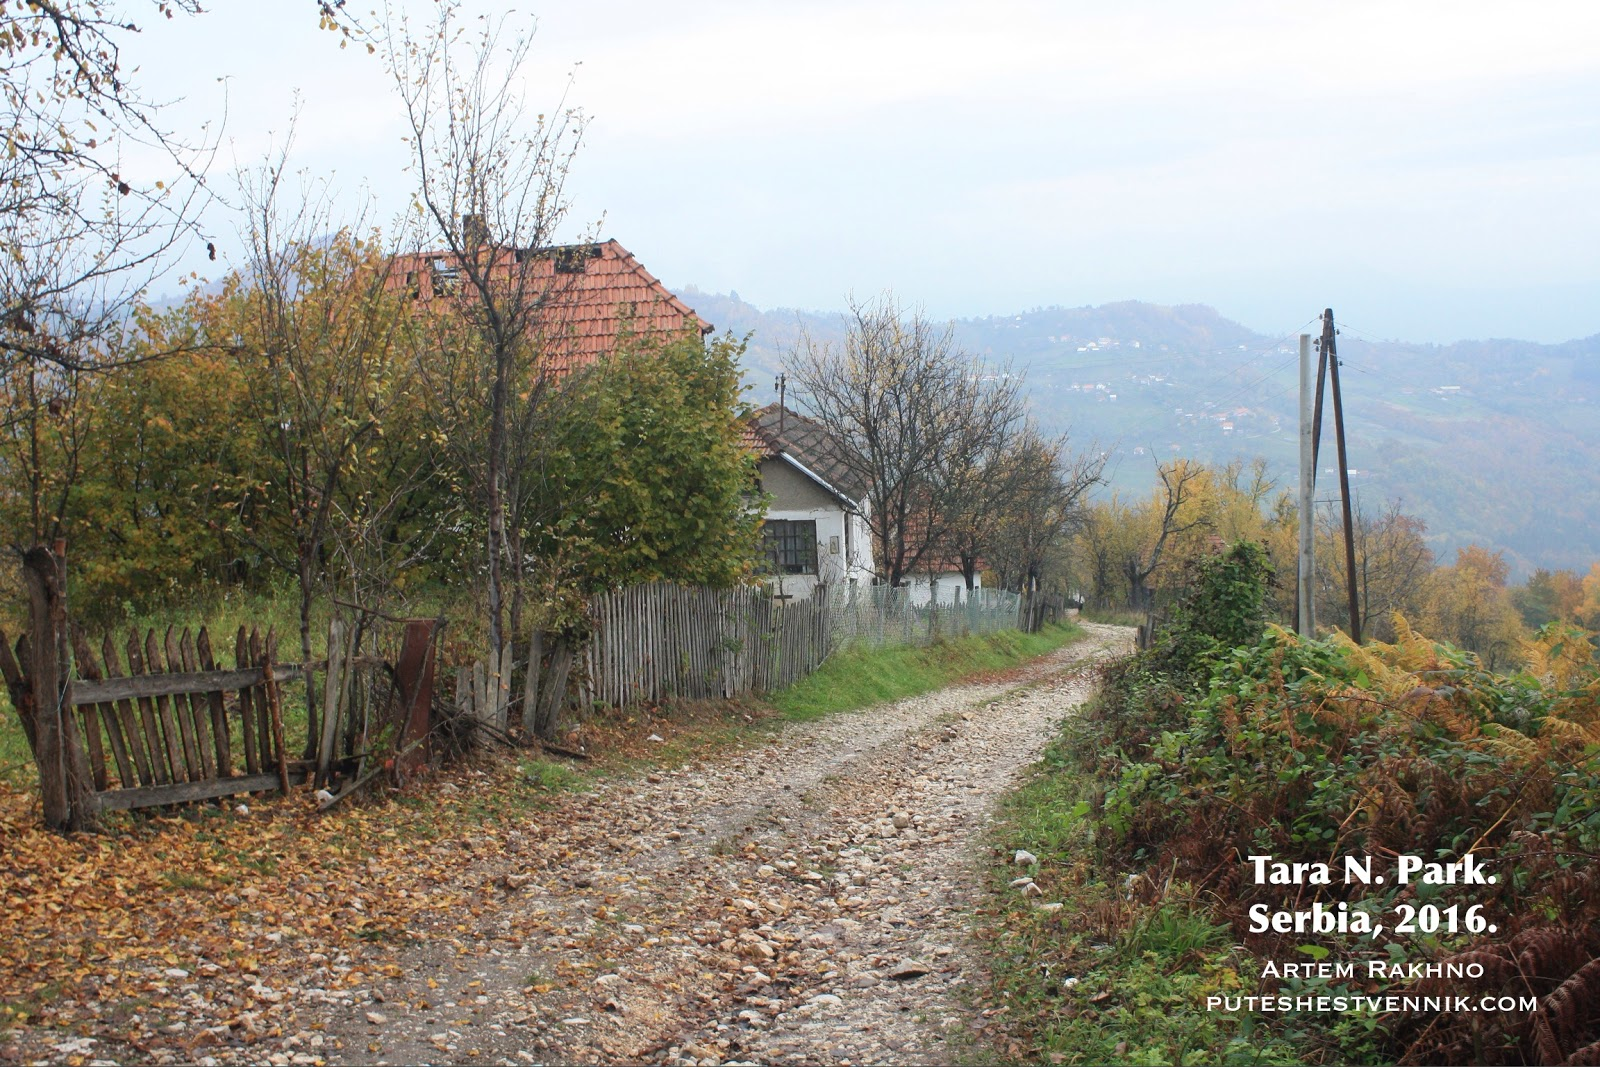 Проселочная дорога и забор